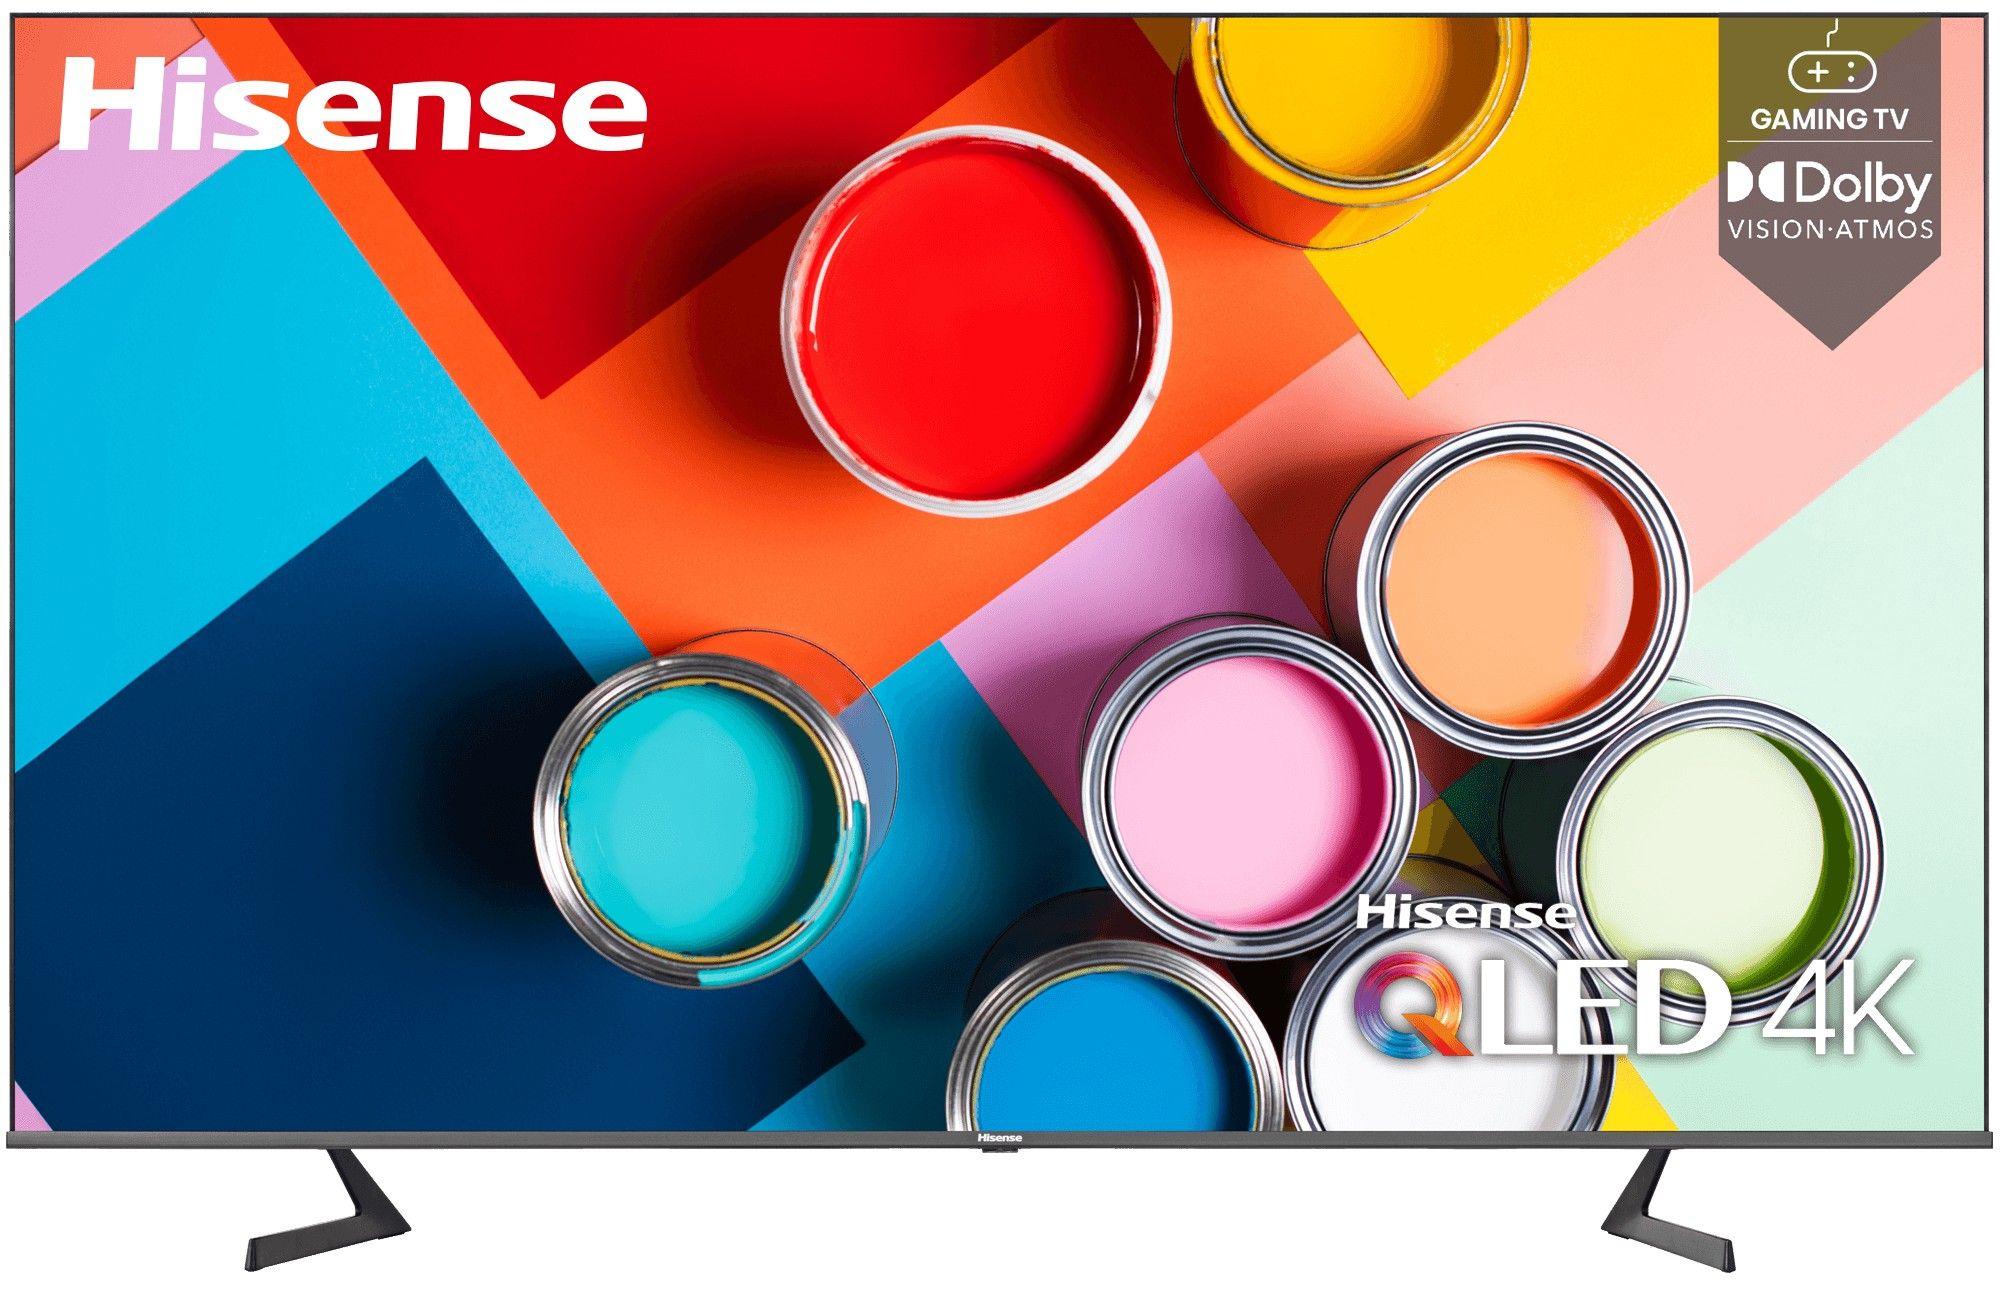 "TV 75"" Hisense75A7GQ (2021) - QLED, 4K, Dolby Vision, Smart TV (+ Jusqu'à 259.50€ en Rakuten Points) - Via ODR de 200€ (Boulanger)"